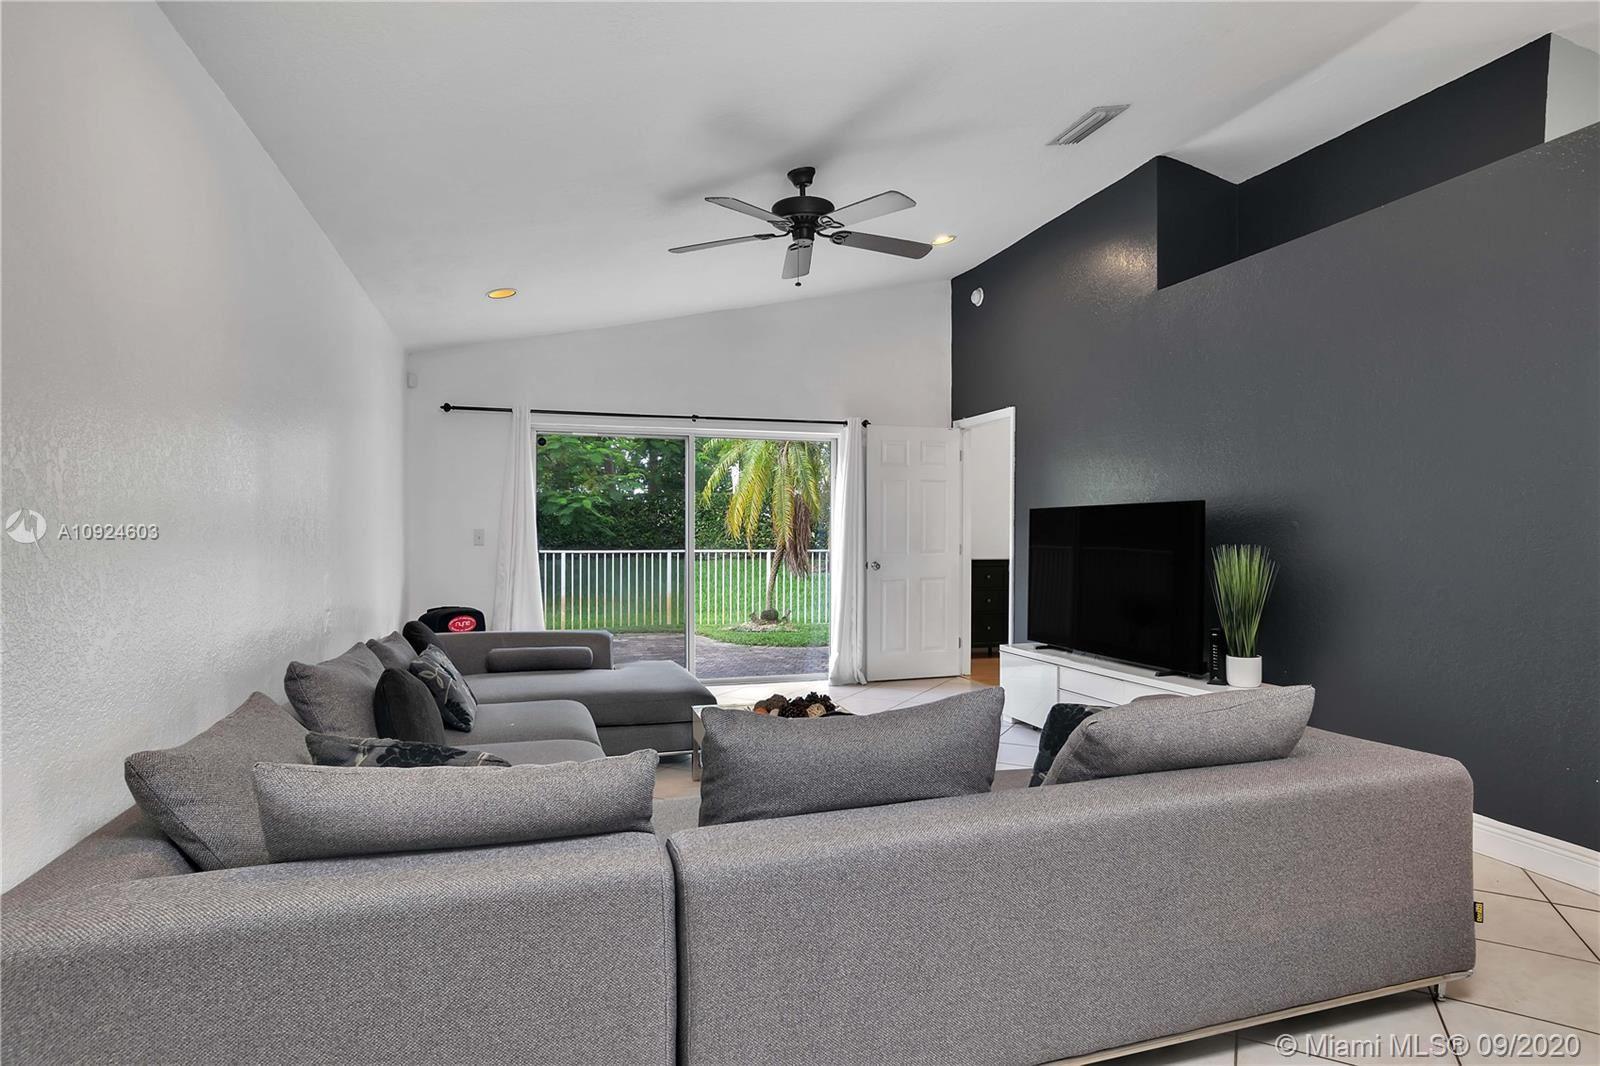 Photo of 1818 SW 177th Ave, Miramar, FL 33029 (MLS # A10924603)